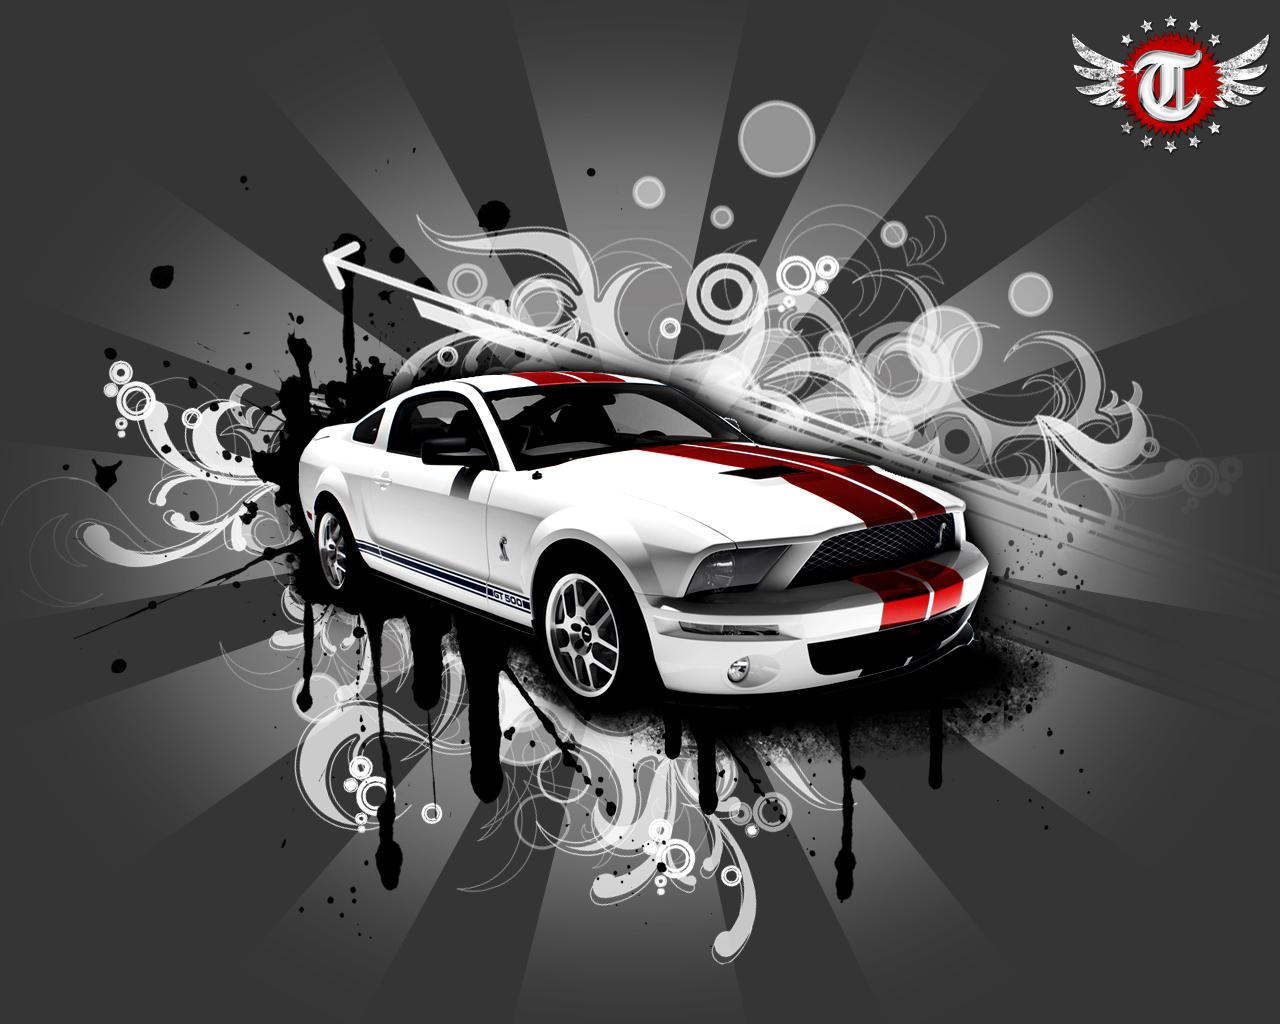 http://3.bp.blogspot.com/_JkEDA-5FY2s/TOFESiqDFPI/AAAAAAAAACM/k2r2Qo3Jqg0/s1600/Mustang_GT500_Wallpaper_by_tomson.jpg